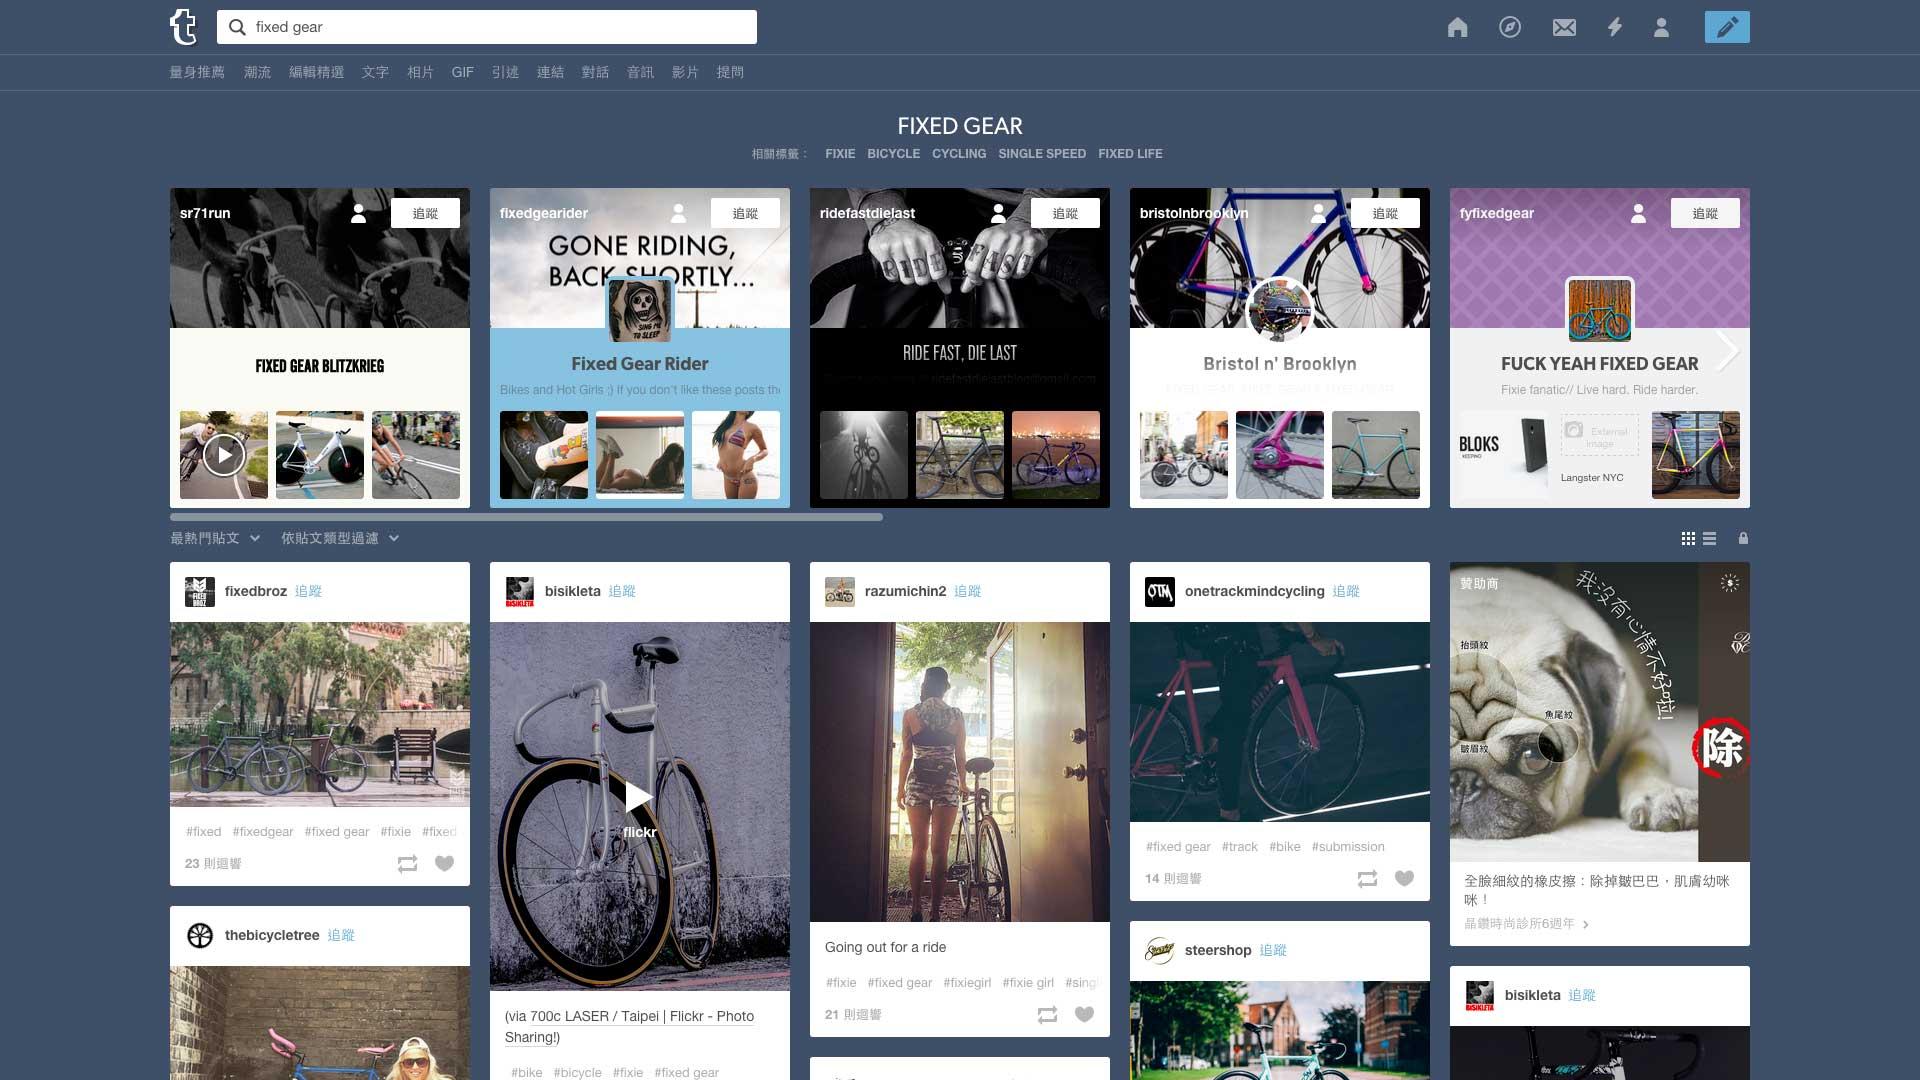 Tumblr 主題探索介面,擅長整合同類型的部落格內容給使用者